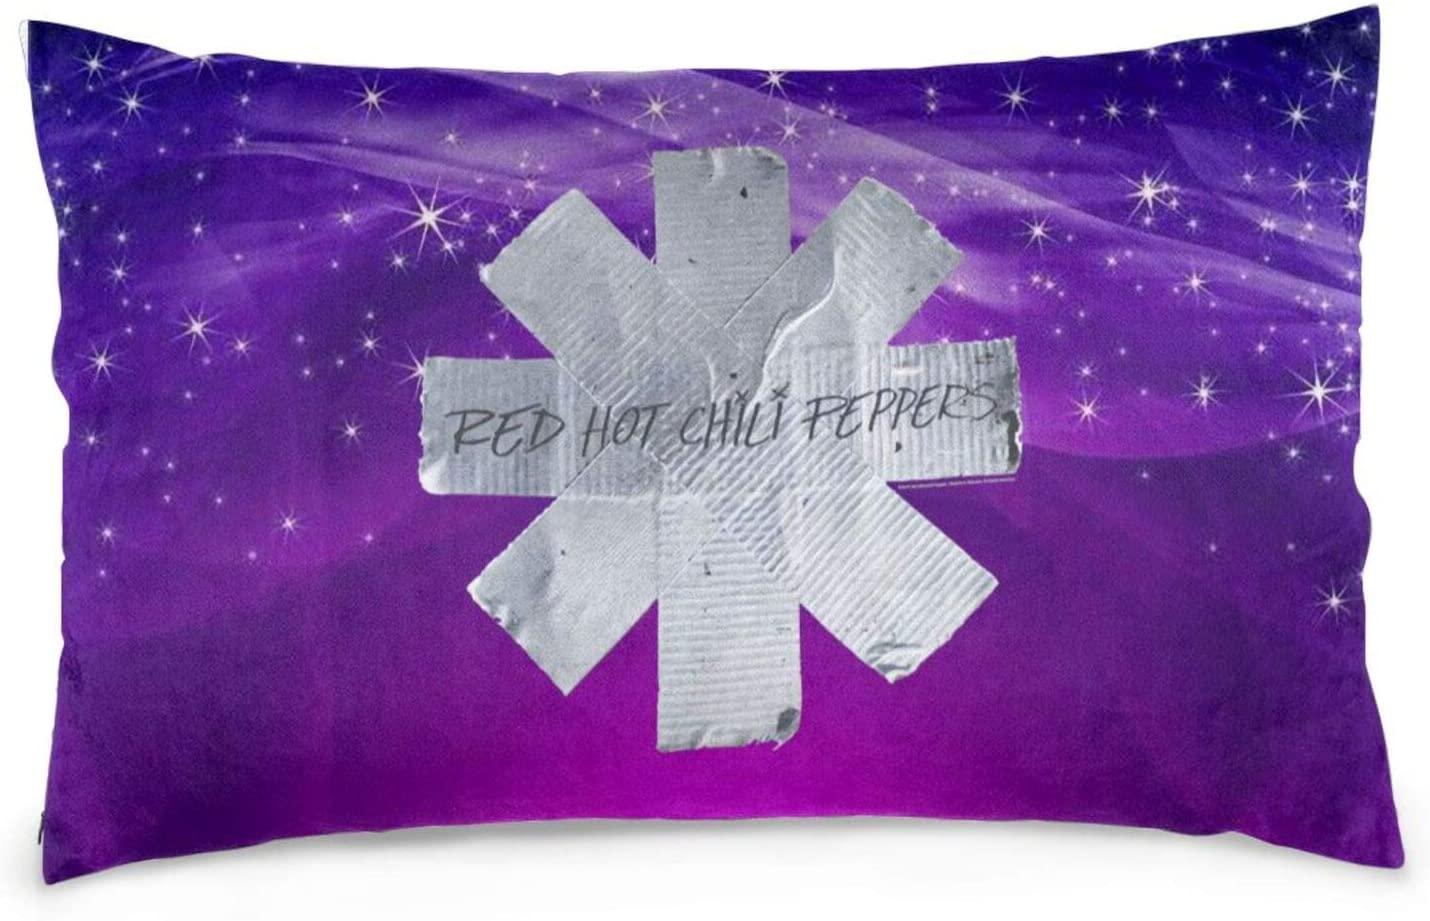 Happy-Life Red Hot Chili Peppers Rectangular Waist Pillow, Rectangular Cushion, Pillow Case